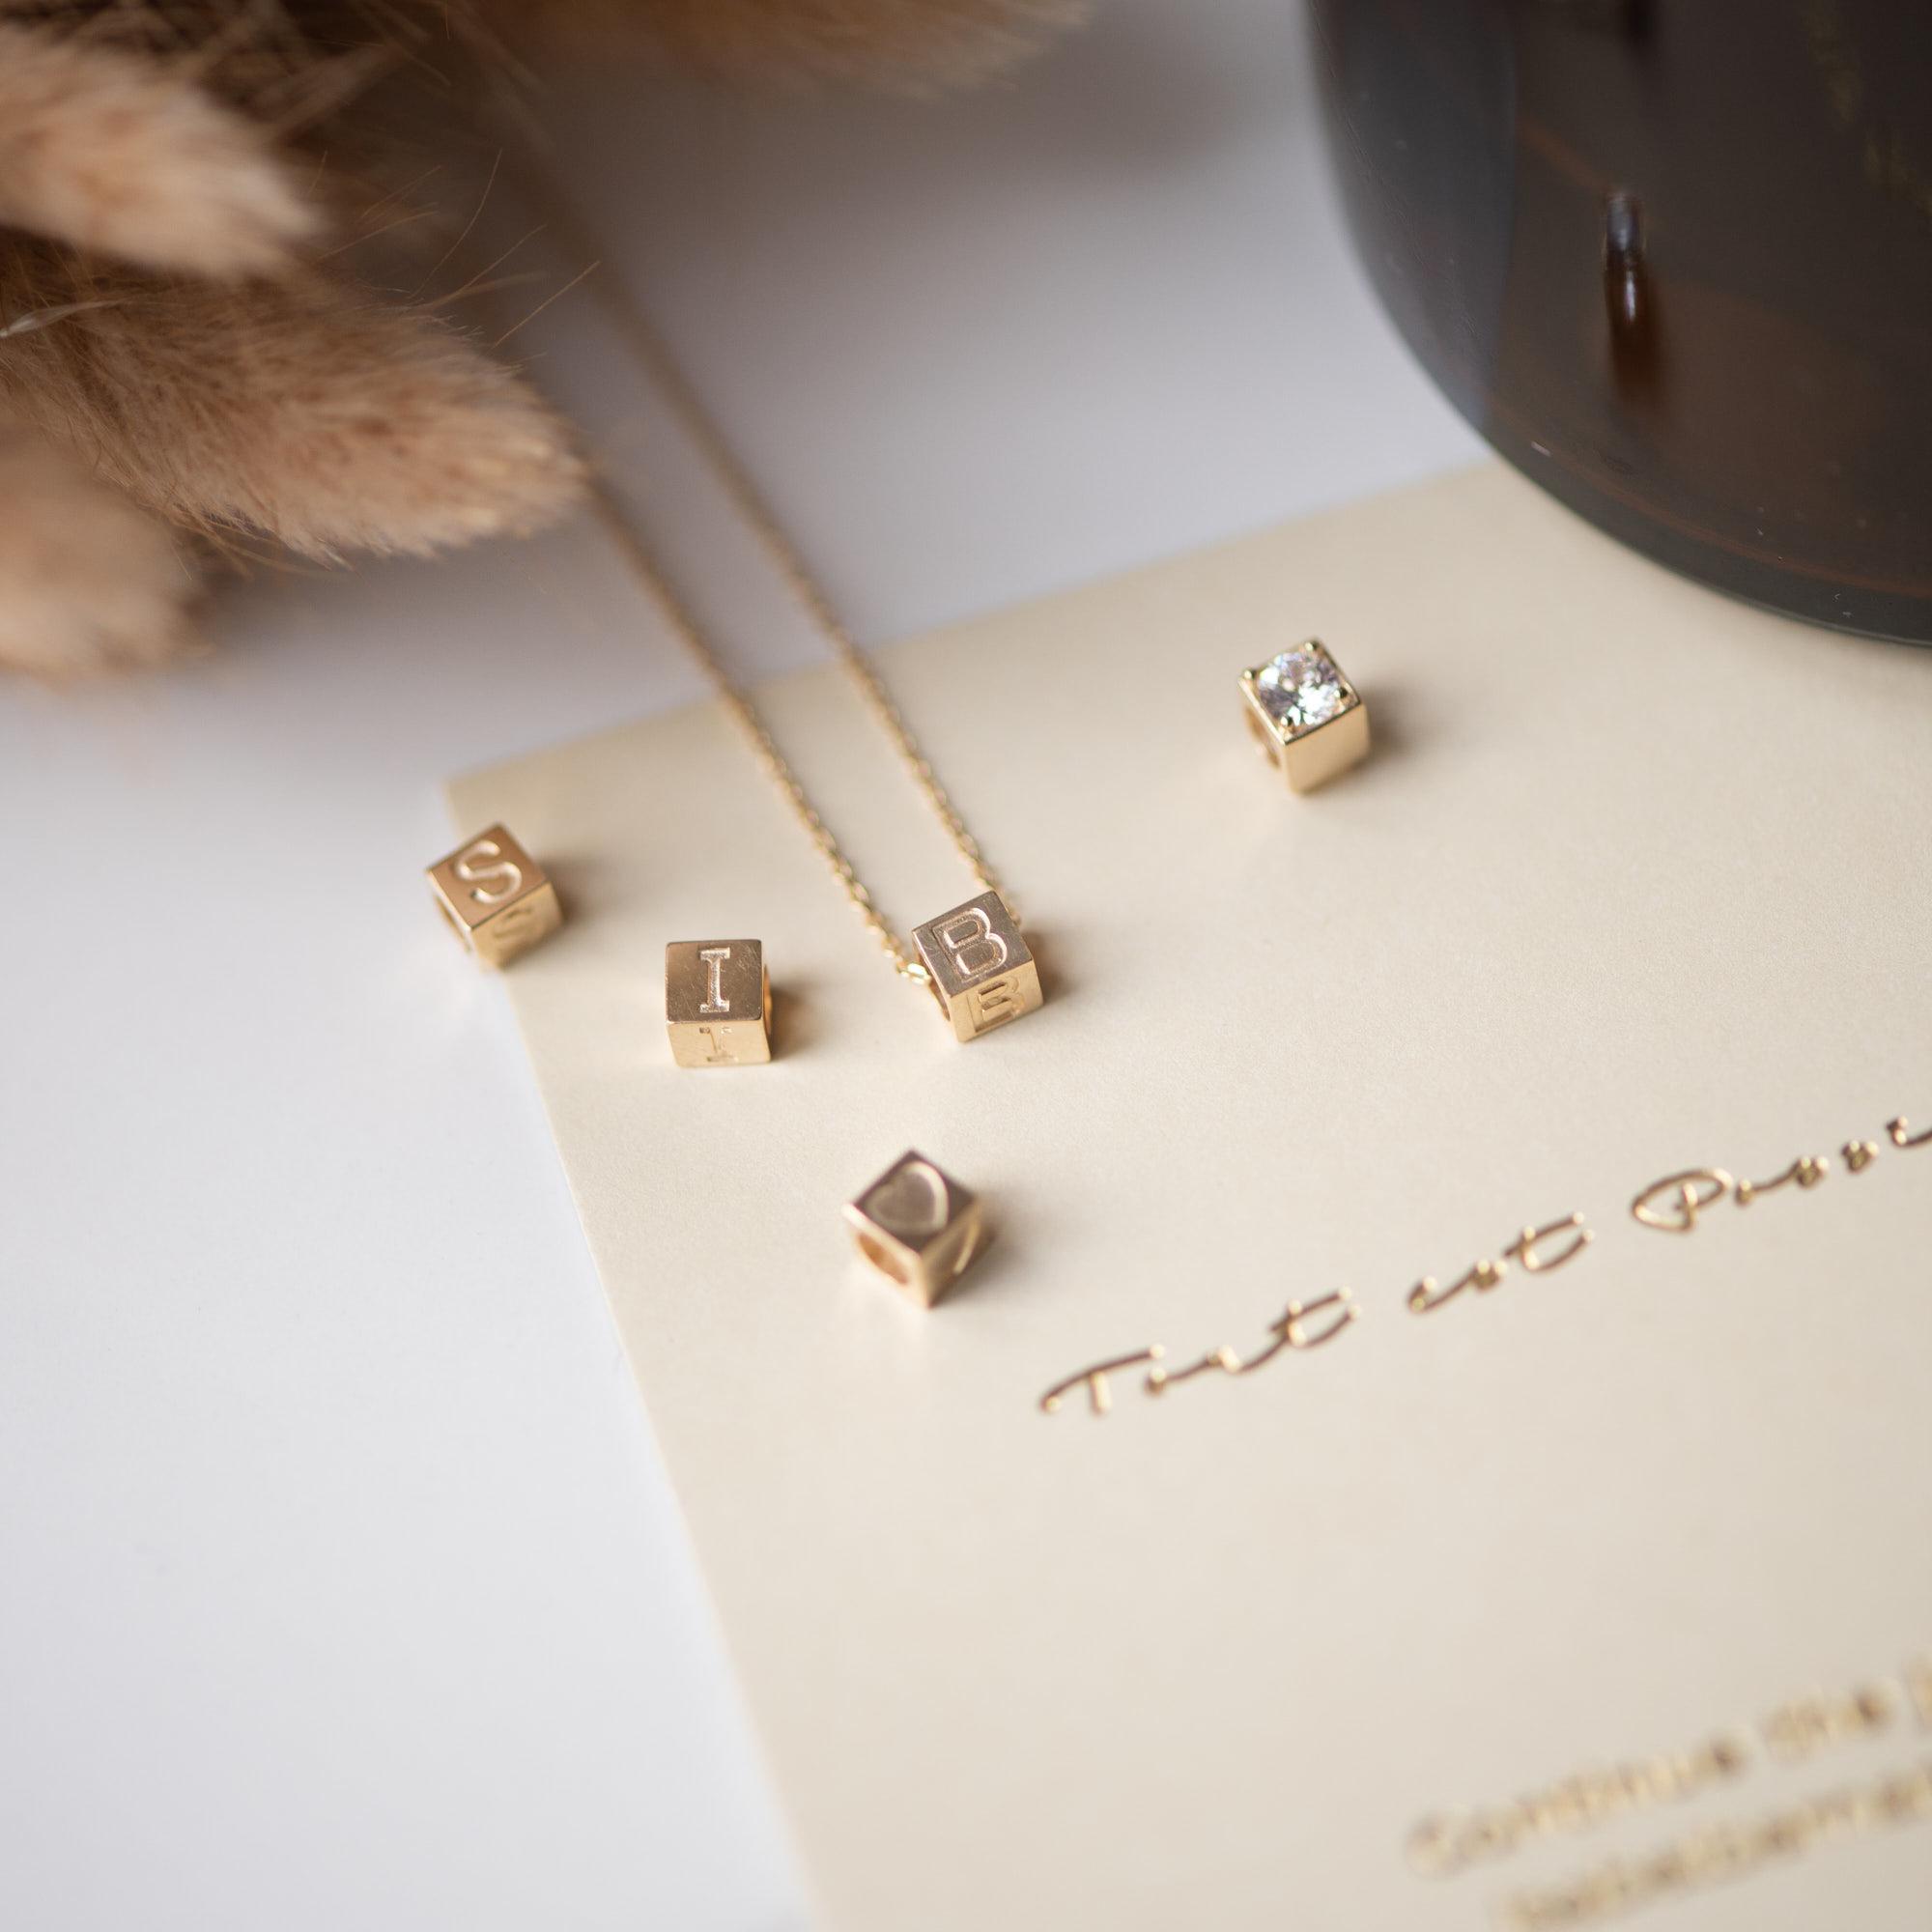 Isabel Bernard Le Carré Felie 14 karaat gouden kubus initial bedel met letter